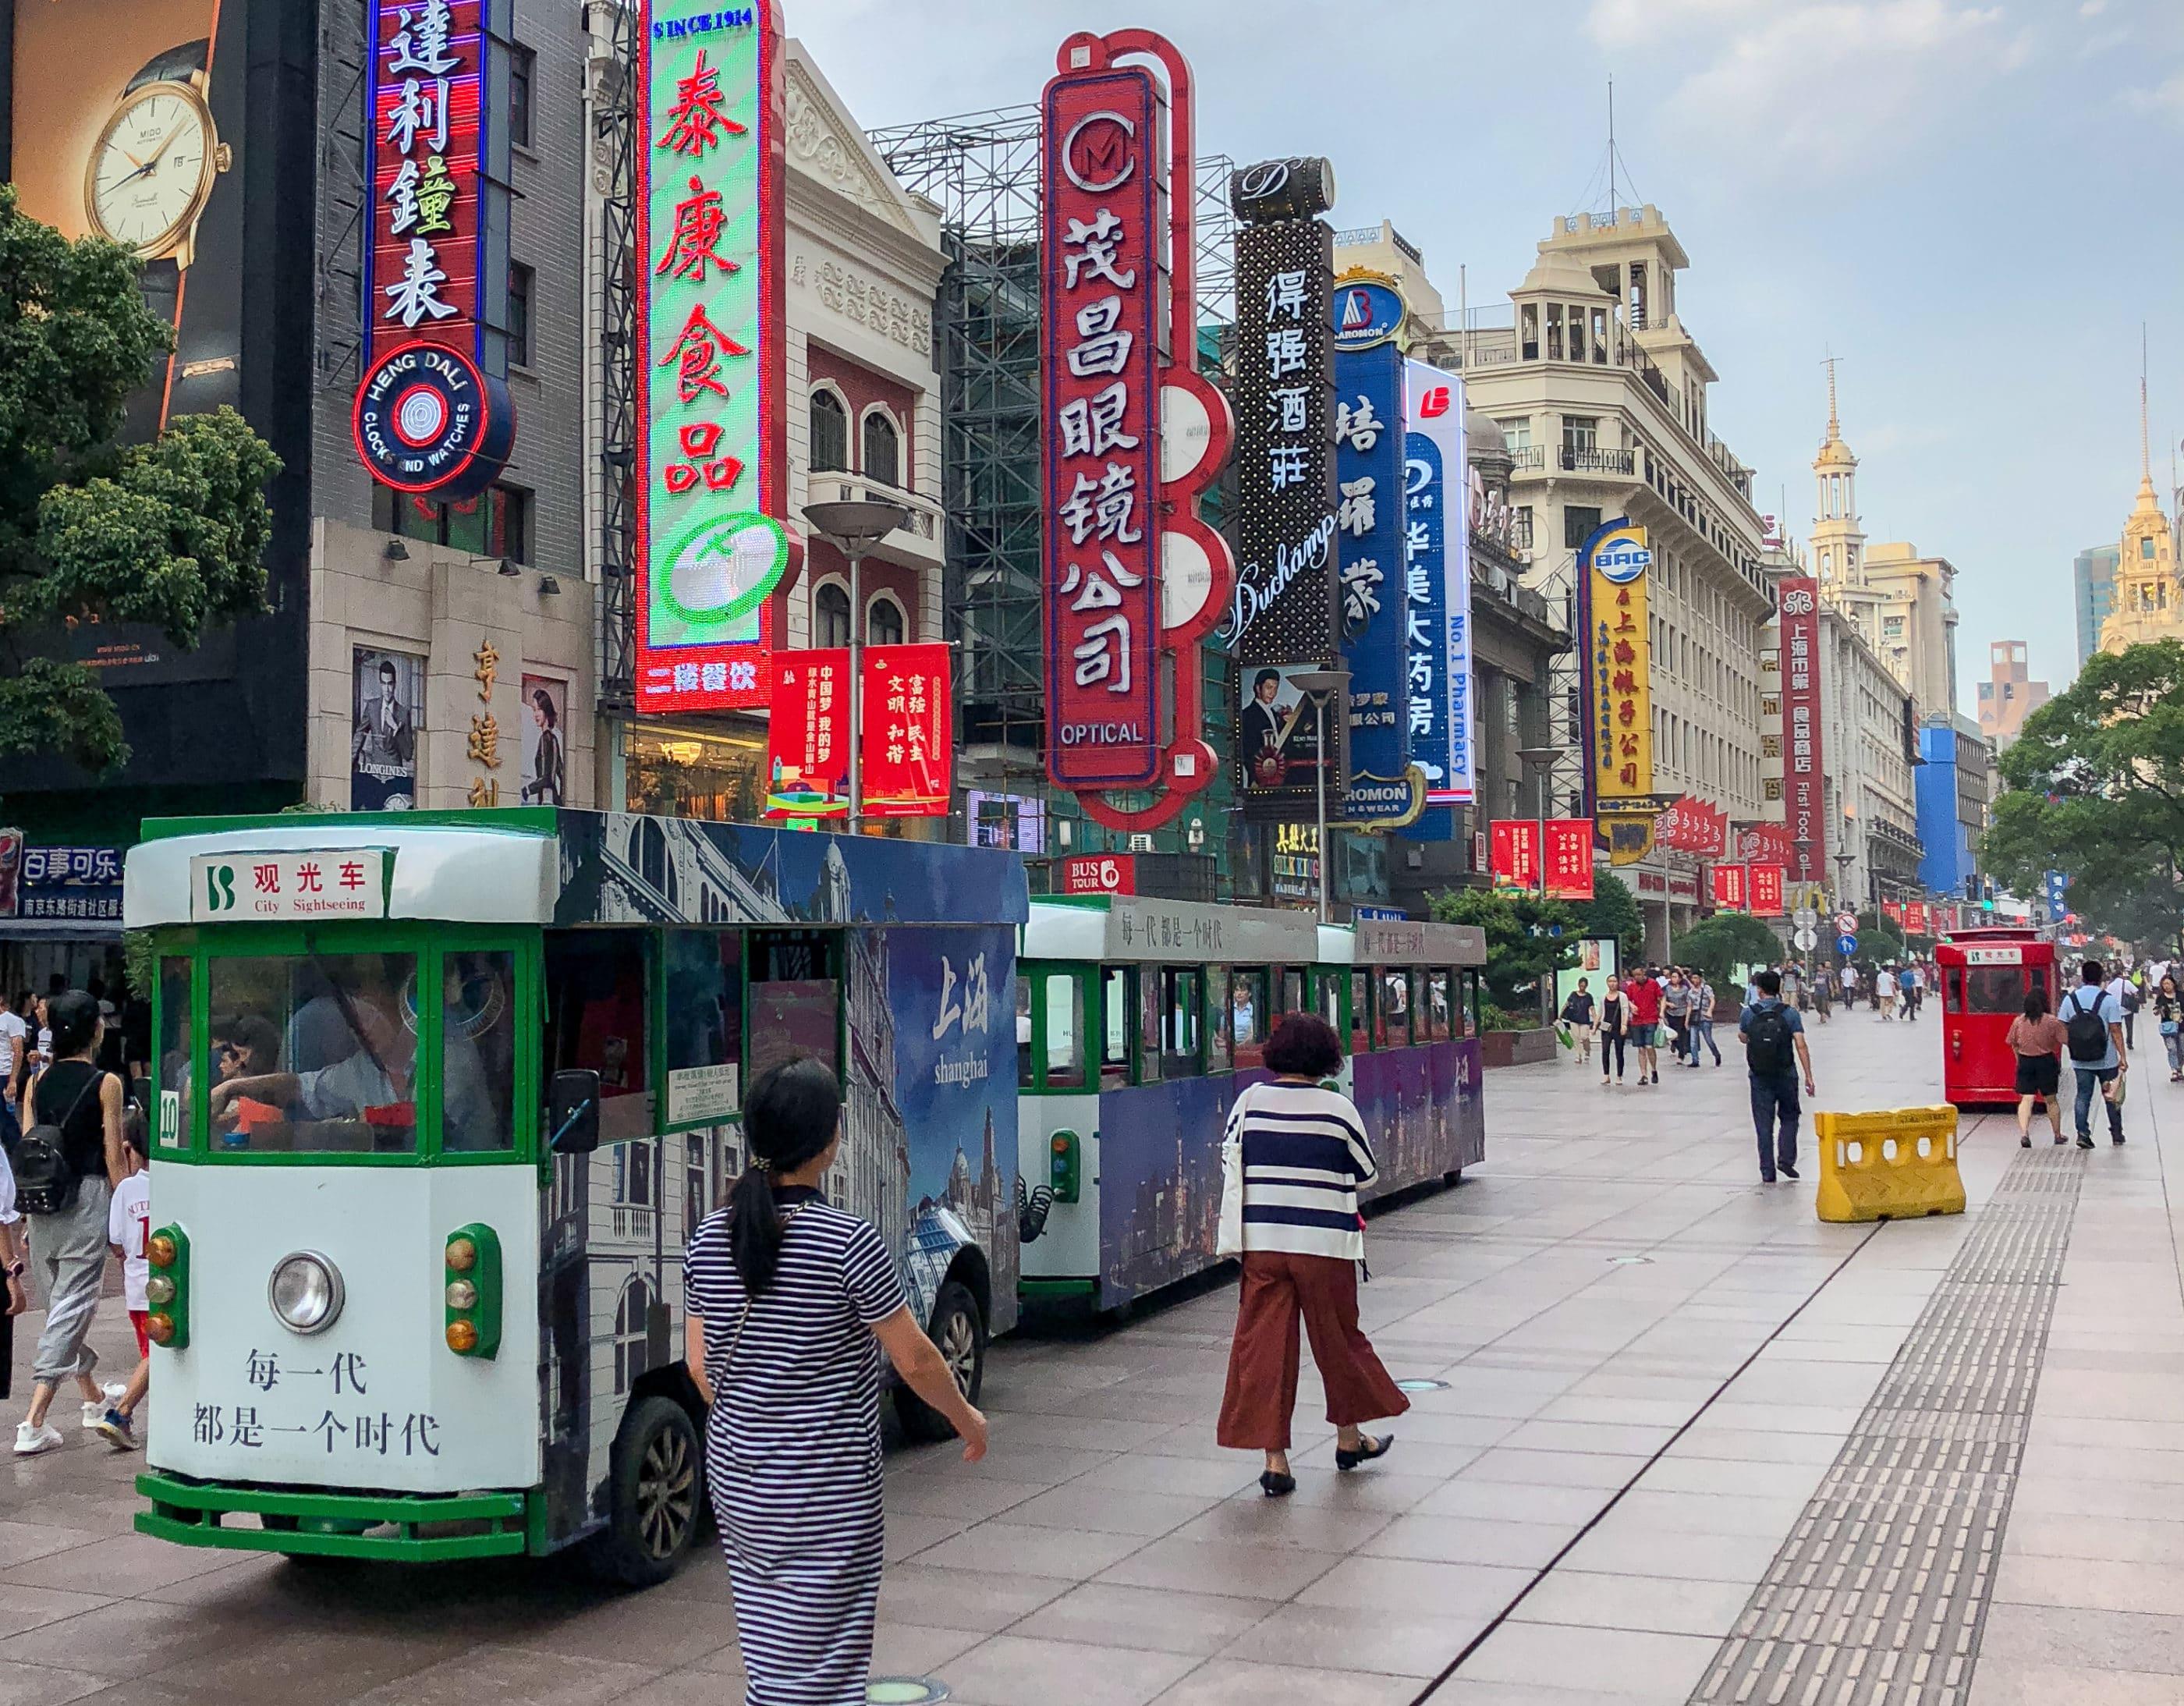 Things to do in Shanghai: Nanjing Road